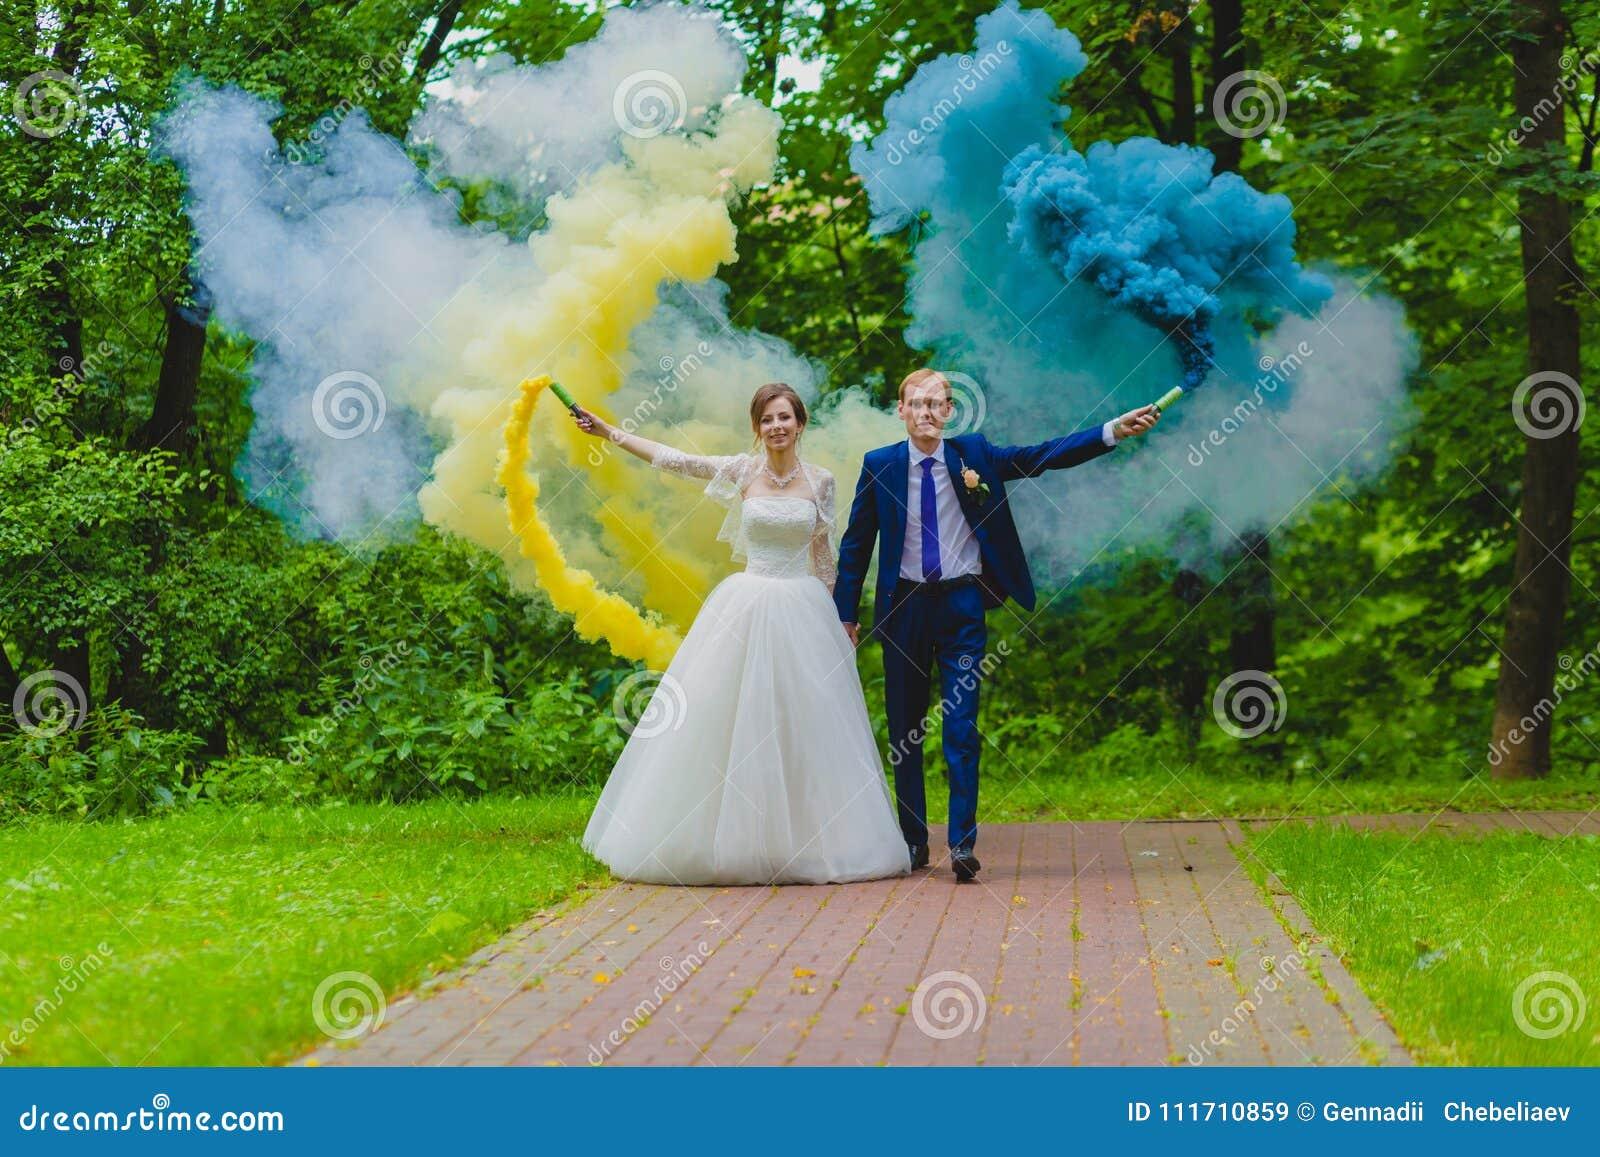 Bride And Groom With Colorful Smoke Bombs Stock Image